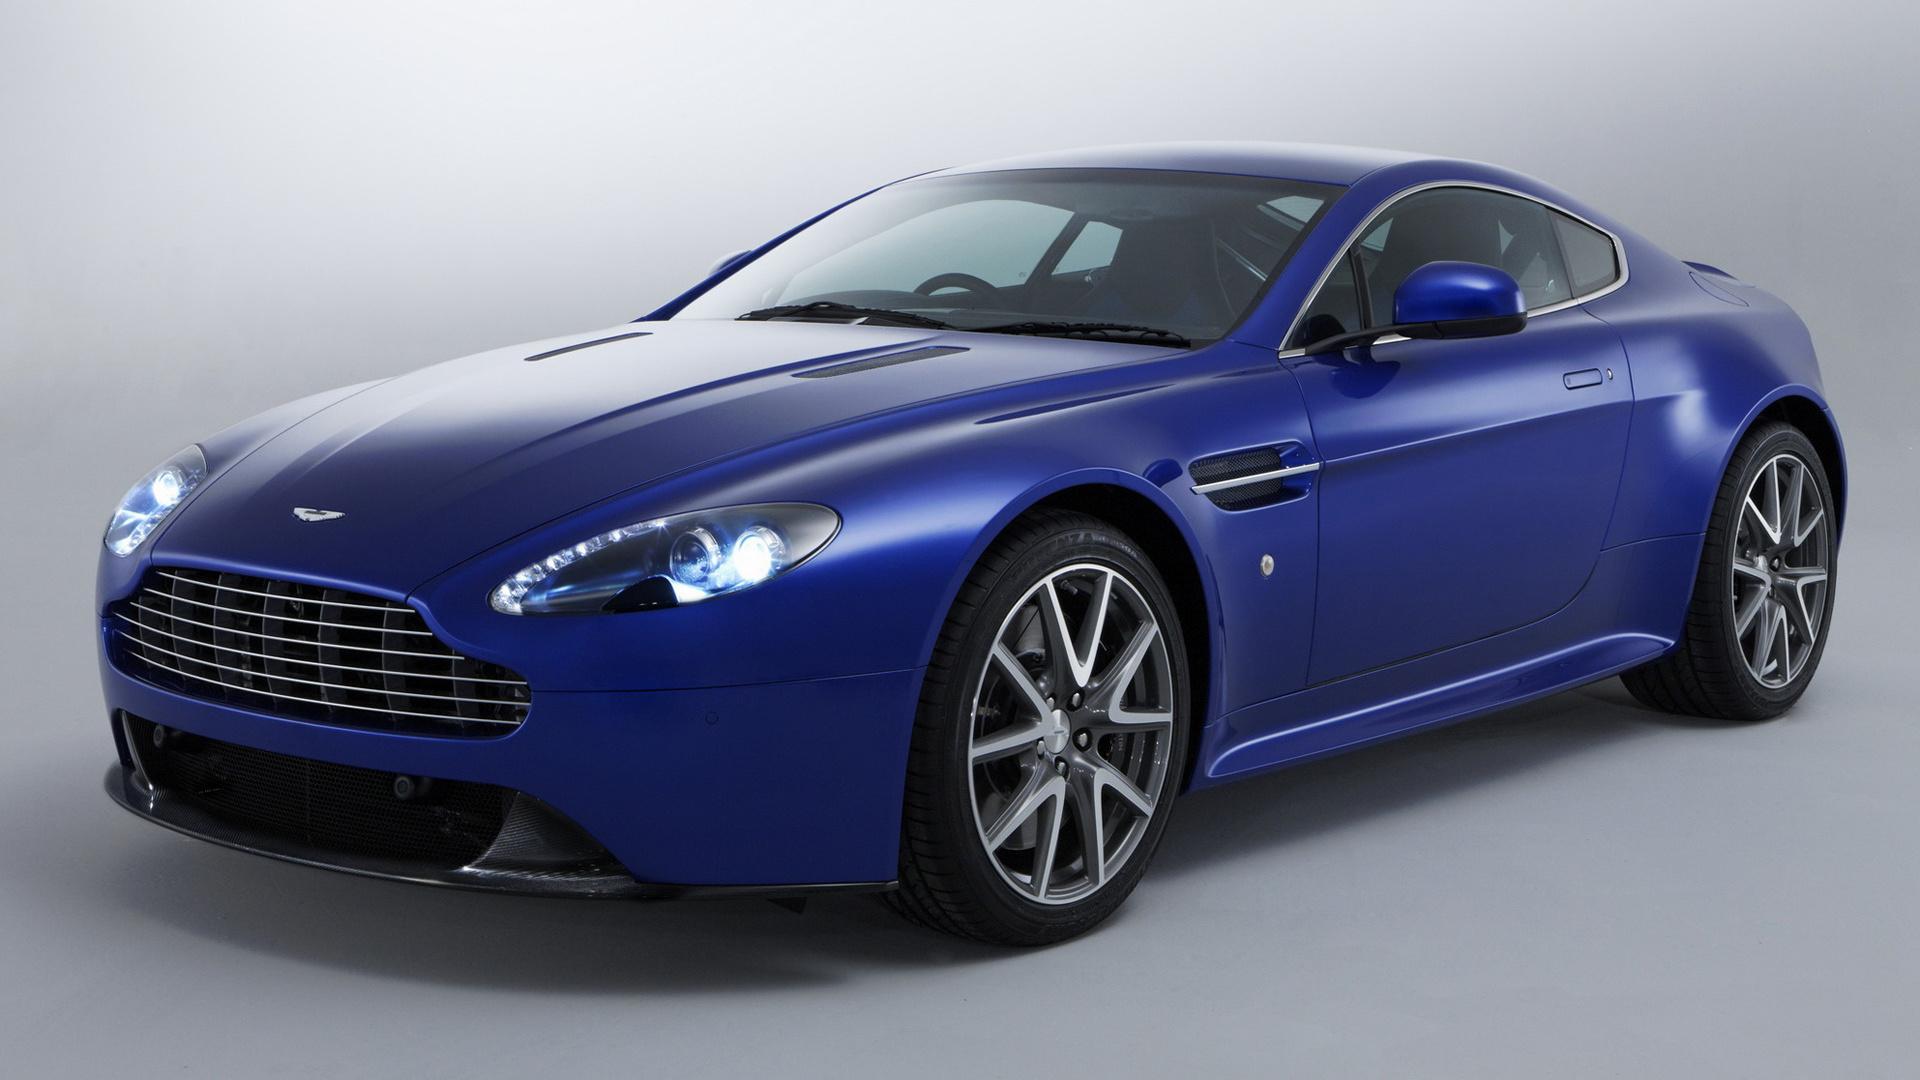 2011 Aston Martin V8 Vantage S Uk Hintergrundbilder Und Wallpaper In Hd Car Pixel